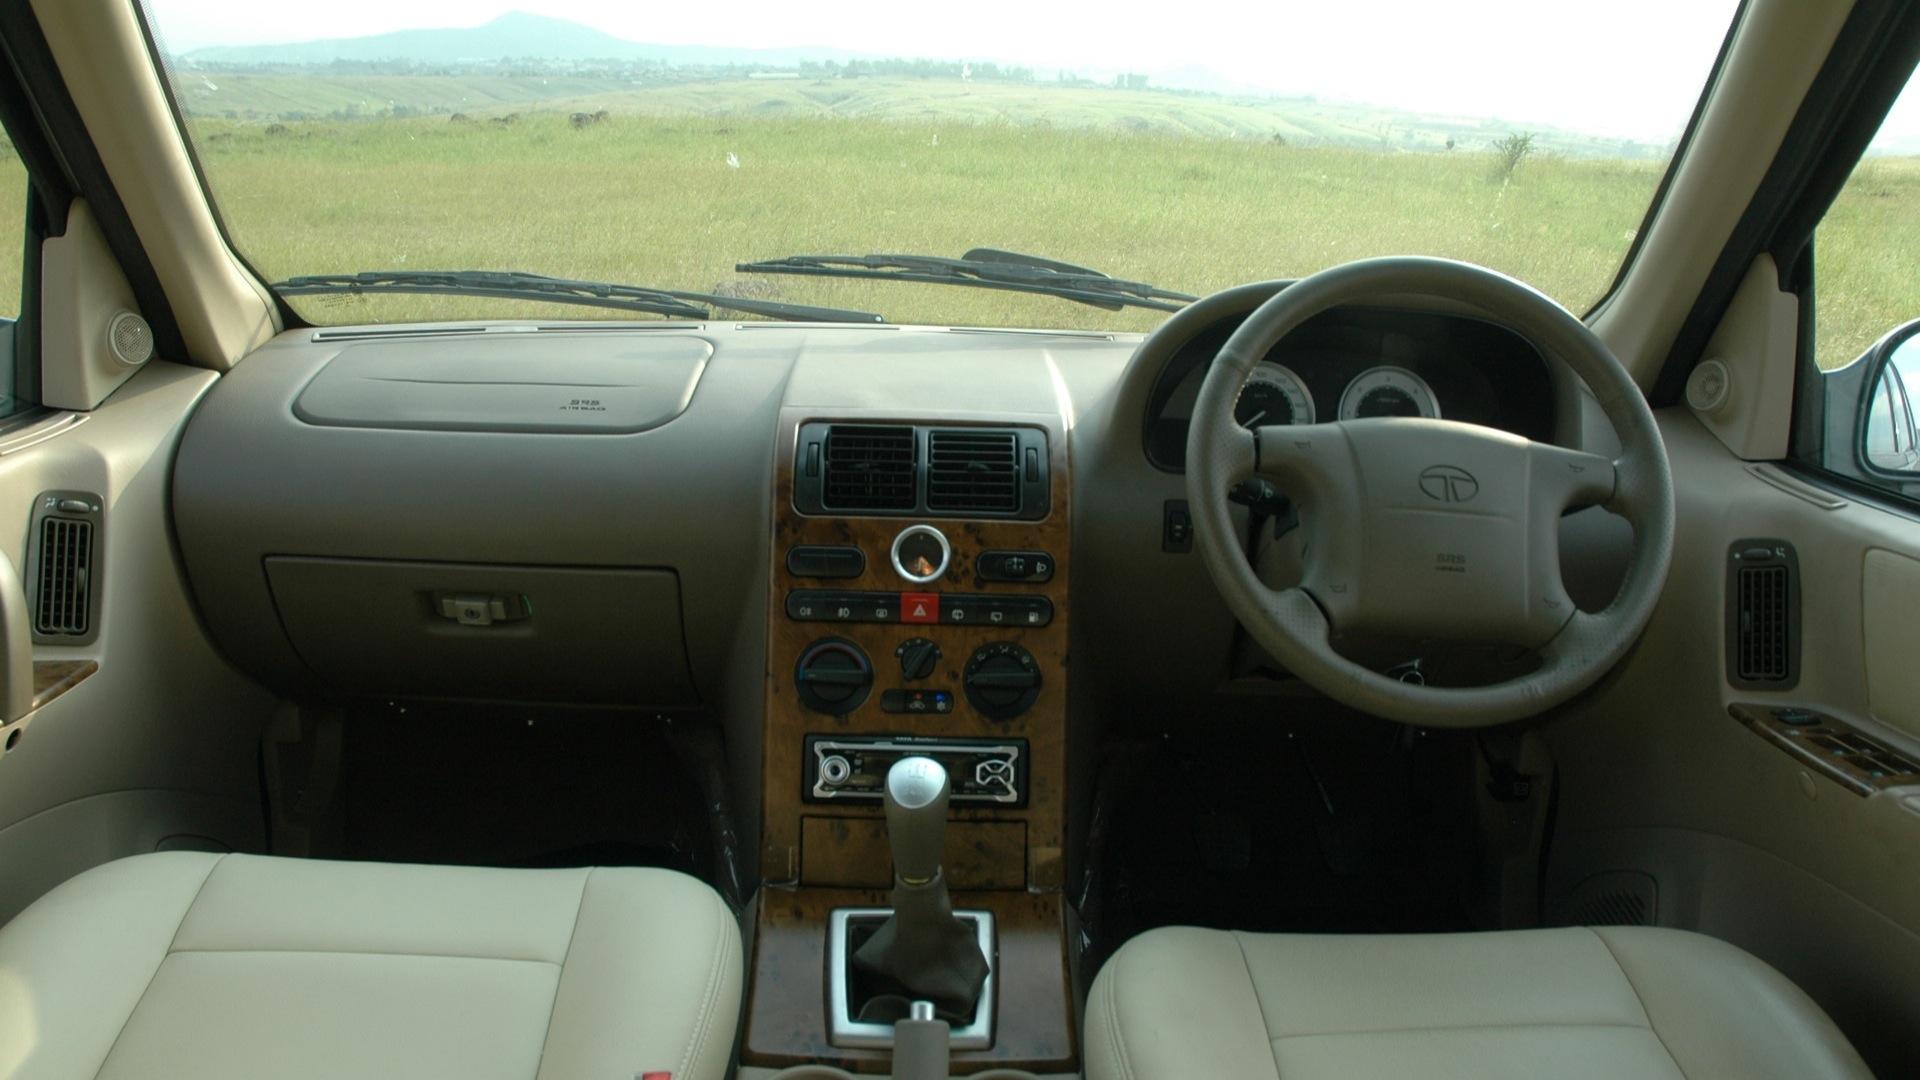 Tata-Safari-2013-2-2-Dicor-LX-2WD Interior